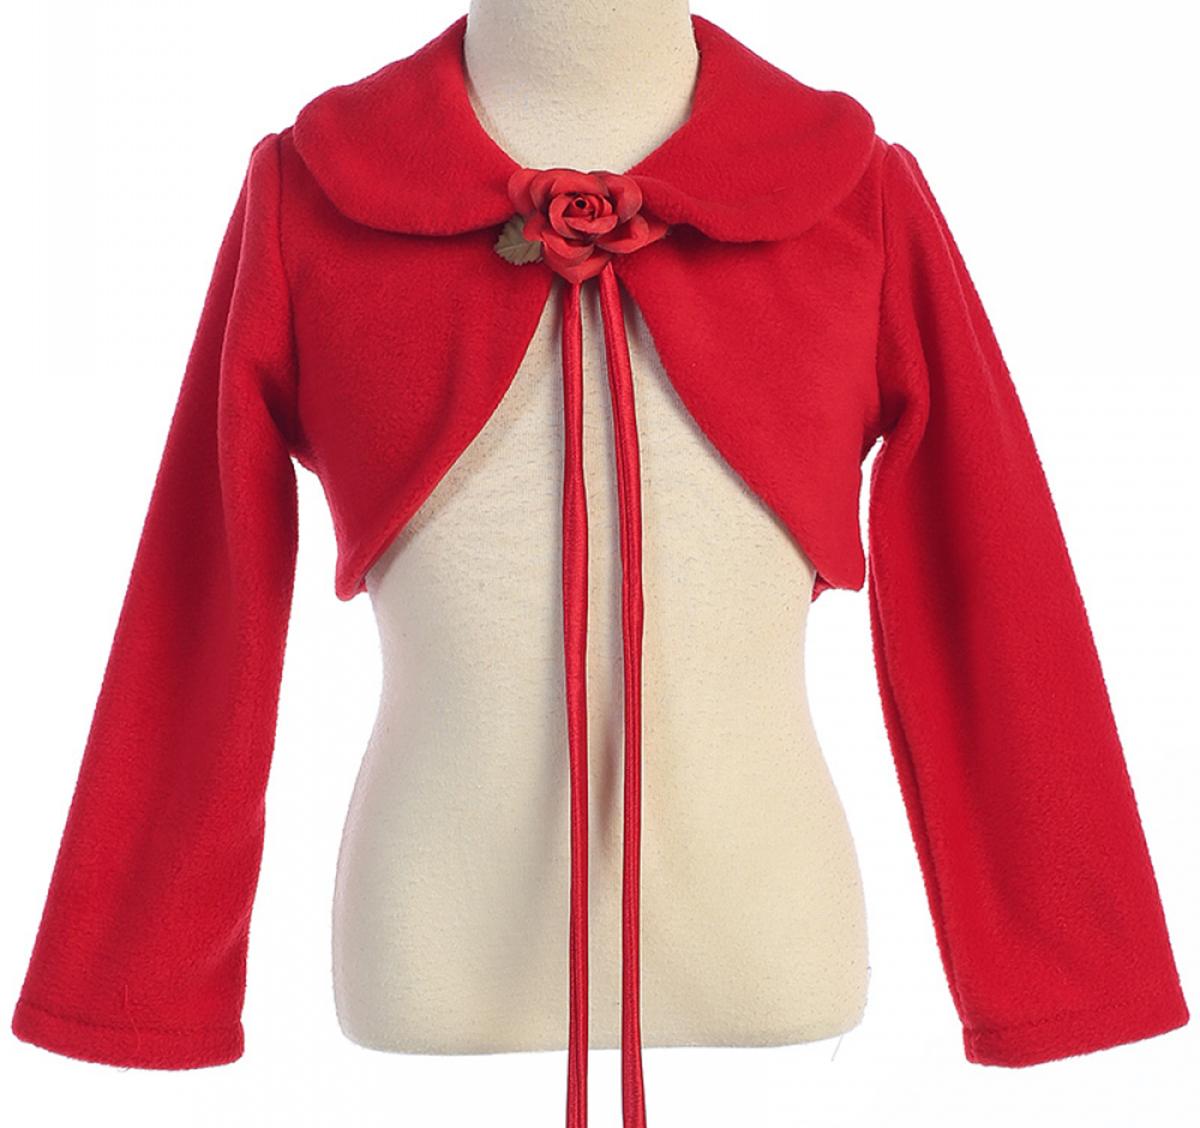 Big Girls' Long Sleeve Fleece Party Flower Girl Bolero Jacket Cover Up Red 8 (K21D6)